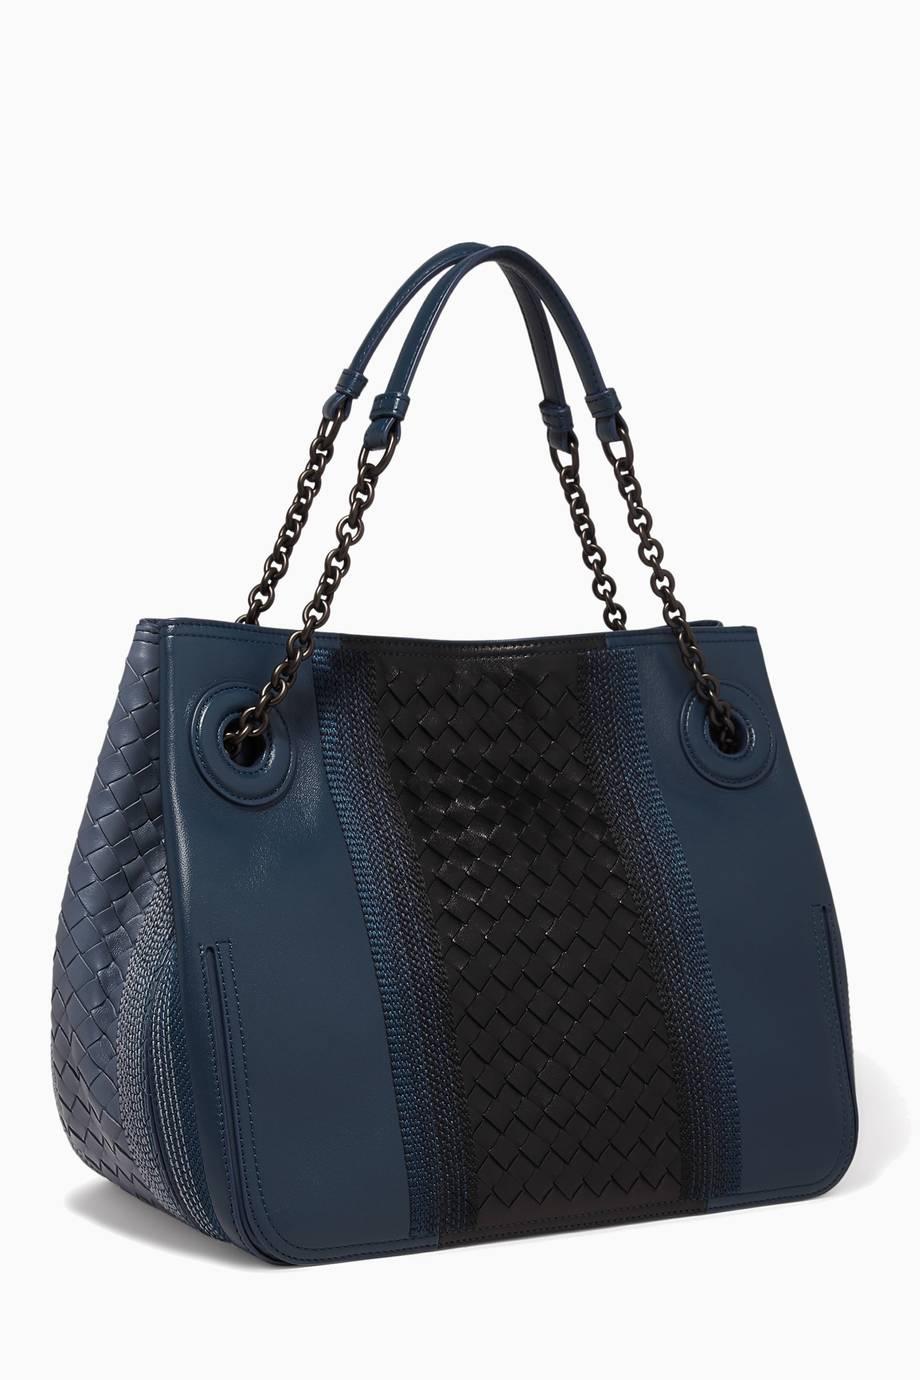 4ba4c060f5 Shop Luxury Bottega Veneta Denim-Blue Large Sunshine Leather Tote ...